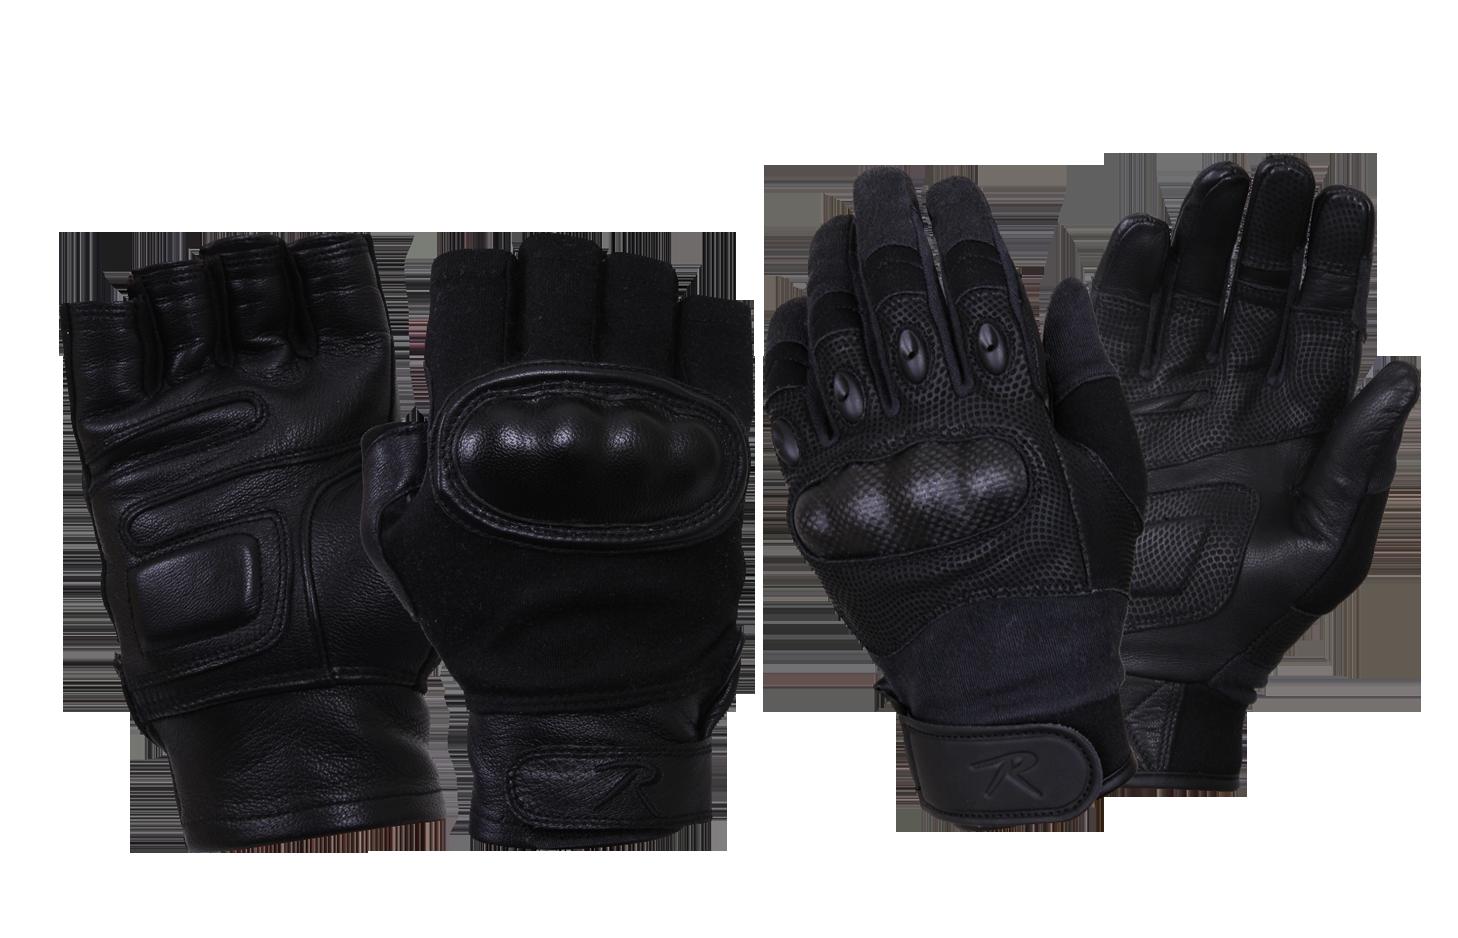 black tactical gloves at bereli